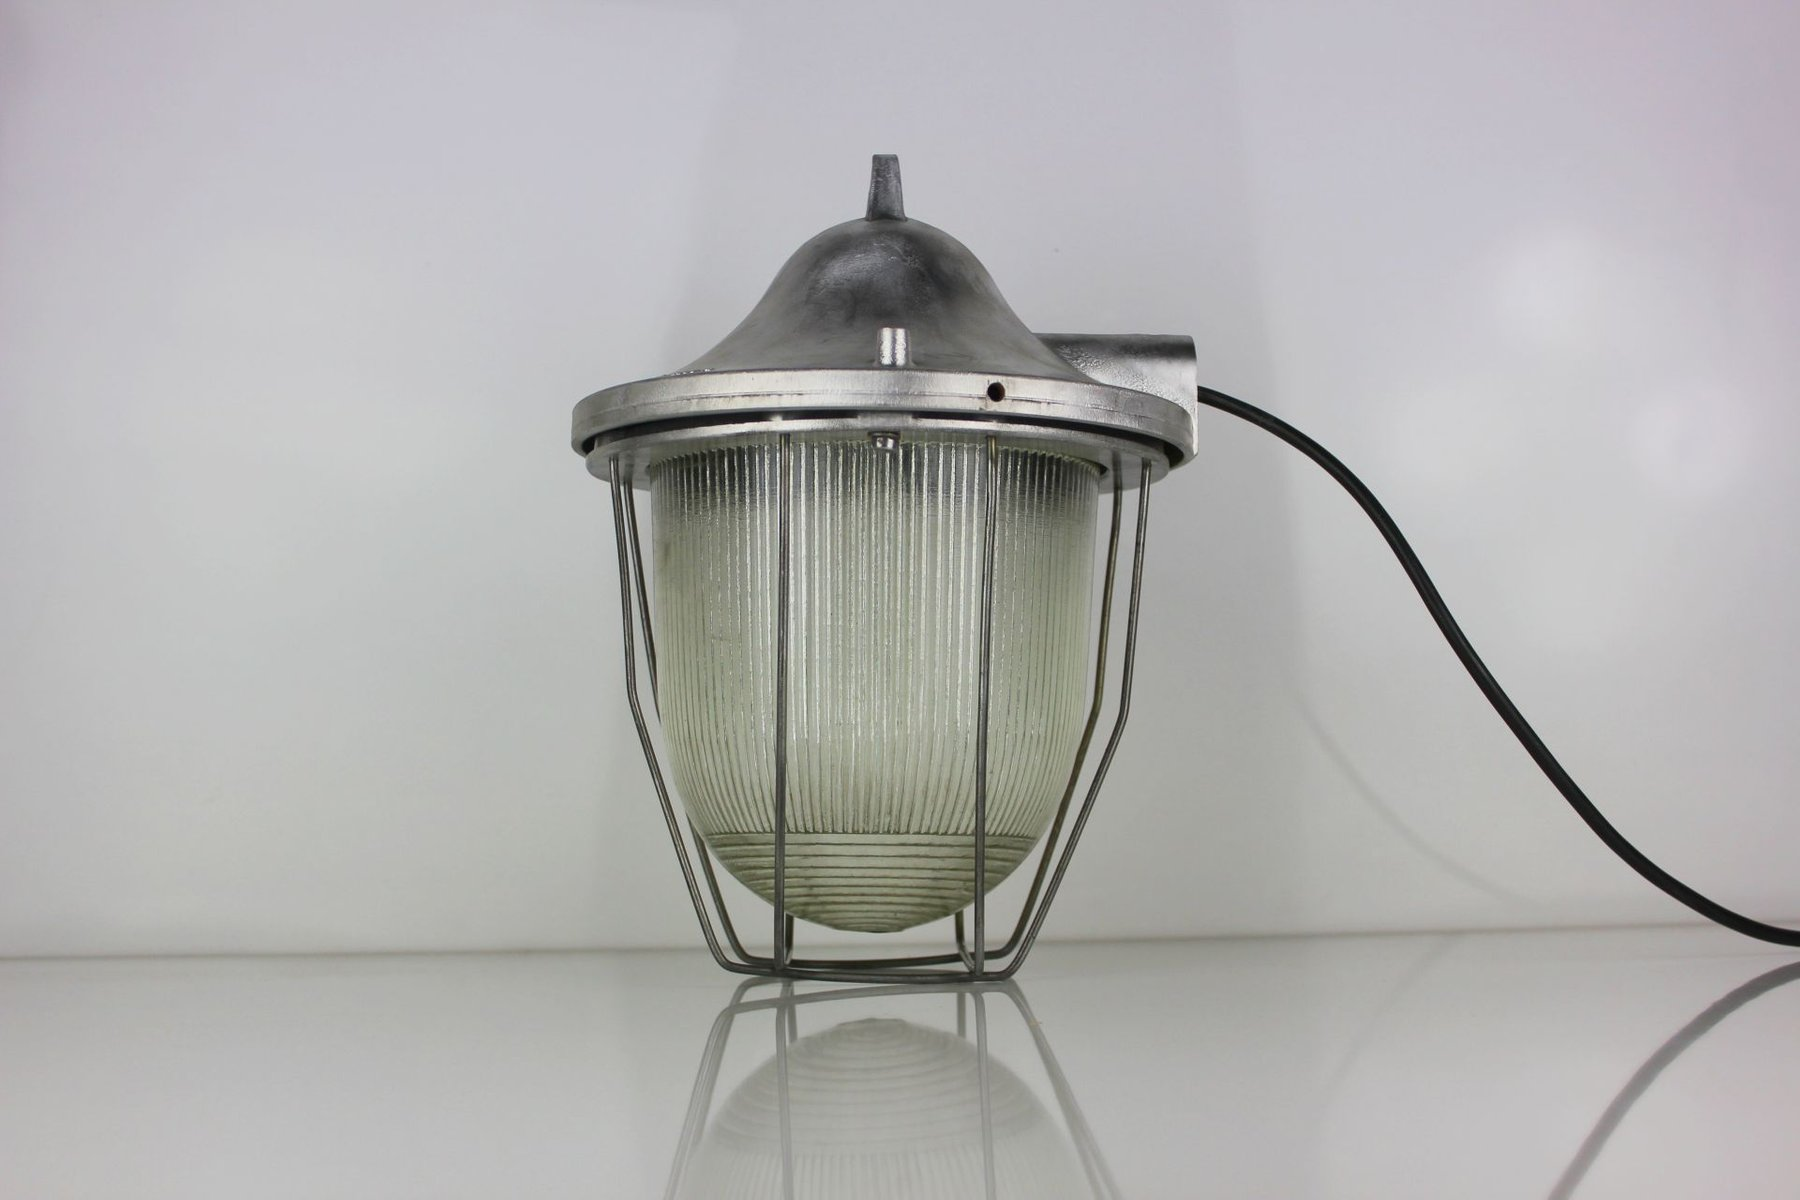 modell c 200 industrie lampe von polam gda sk 1960er bei pamono kaufen. Black Bedroom Furniture Sets. Home Design Ideas